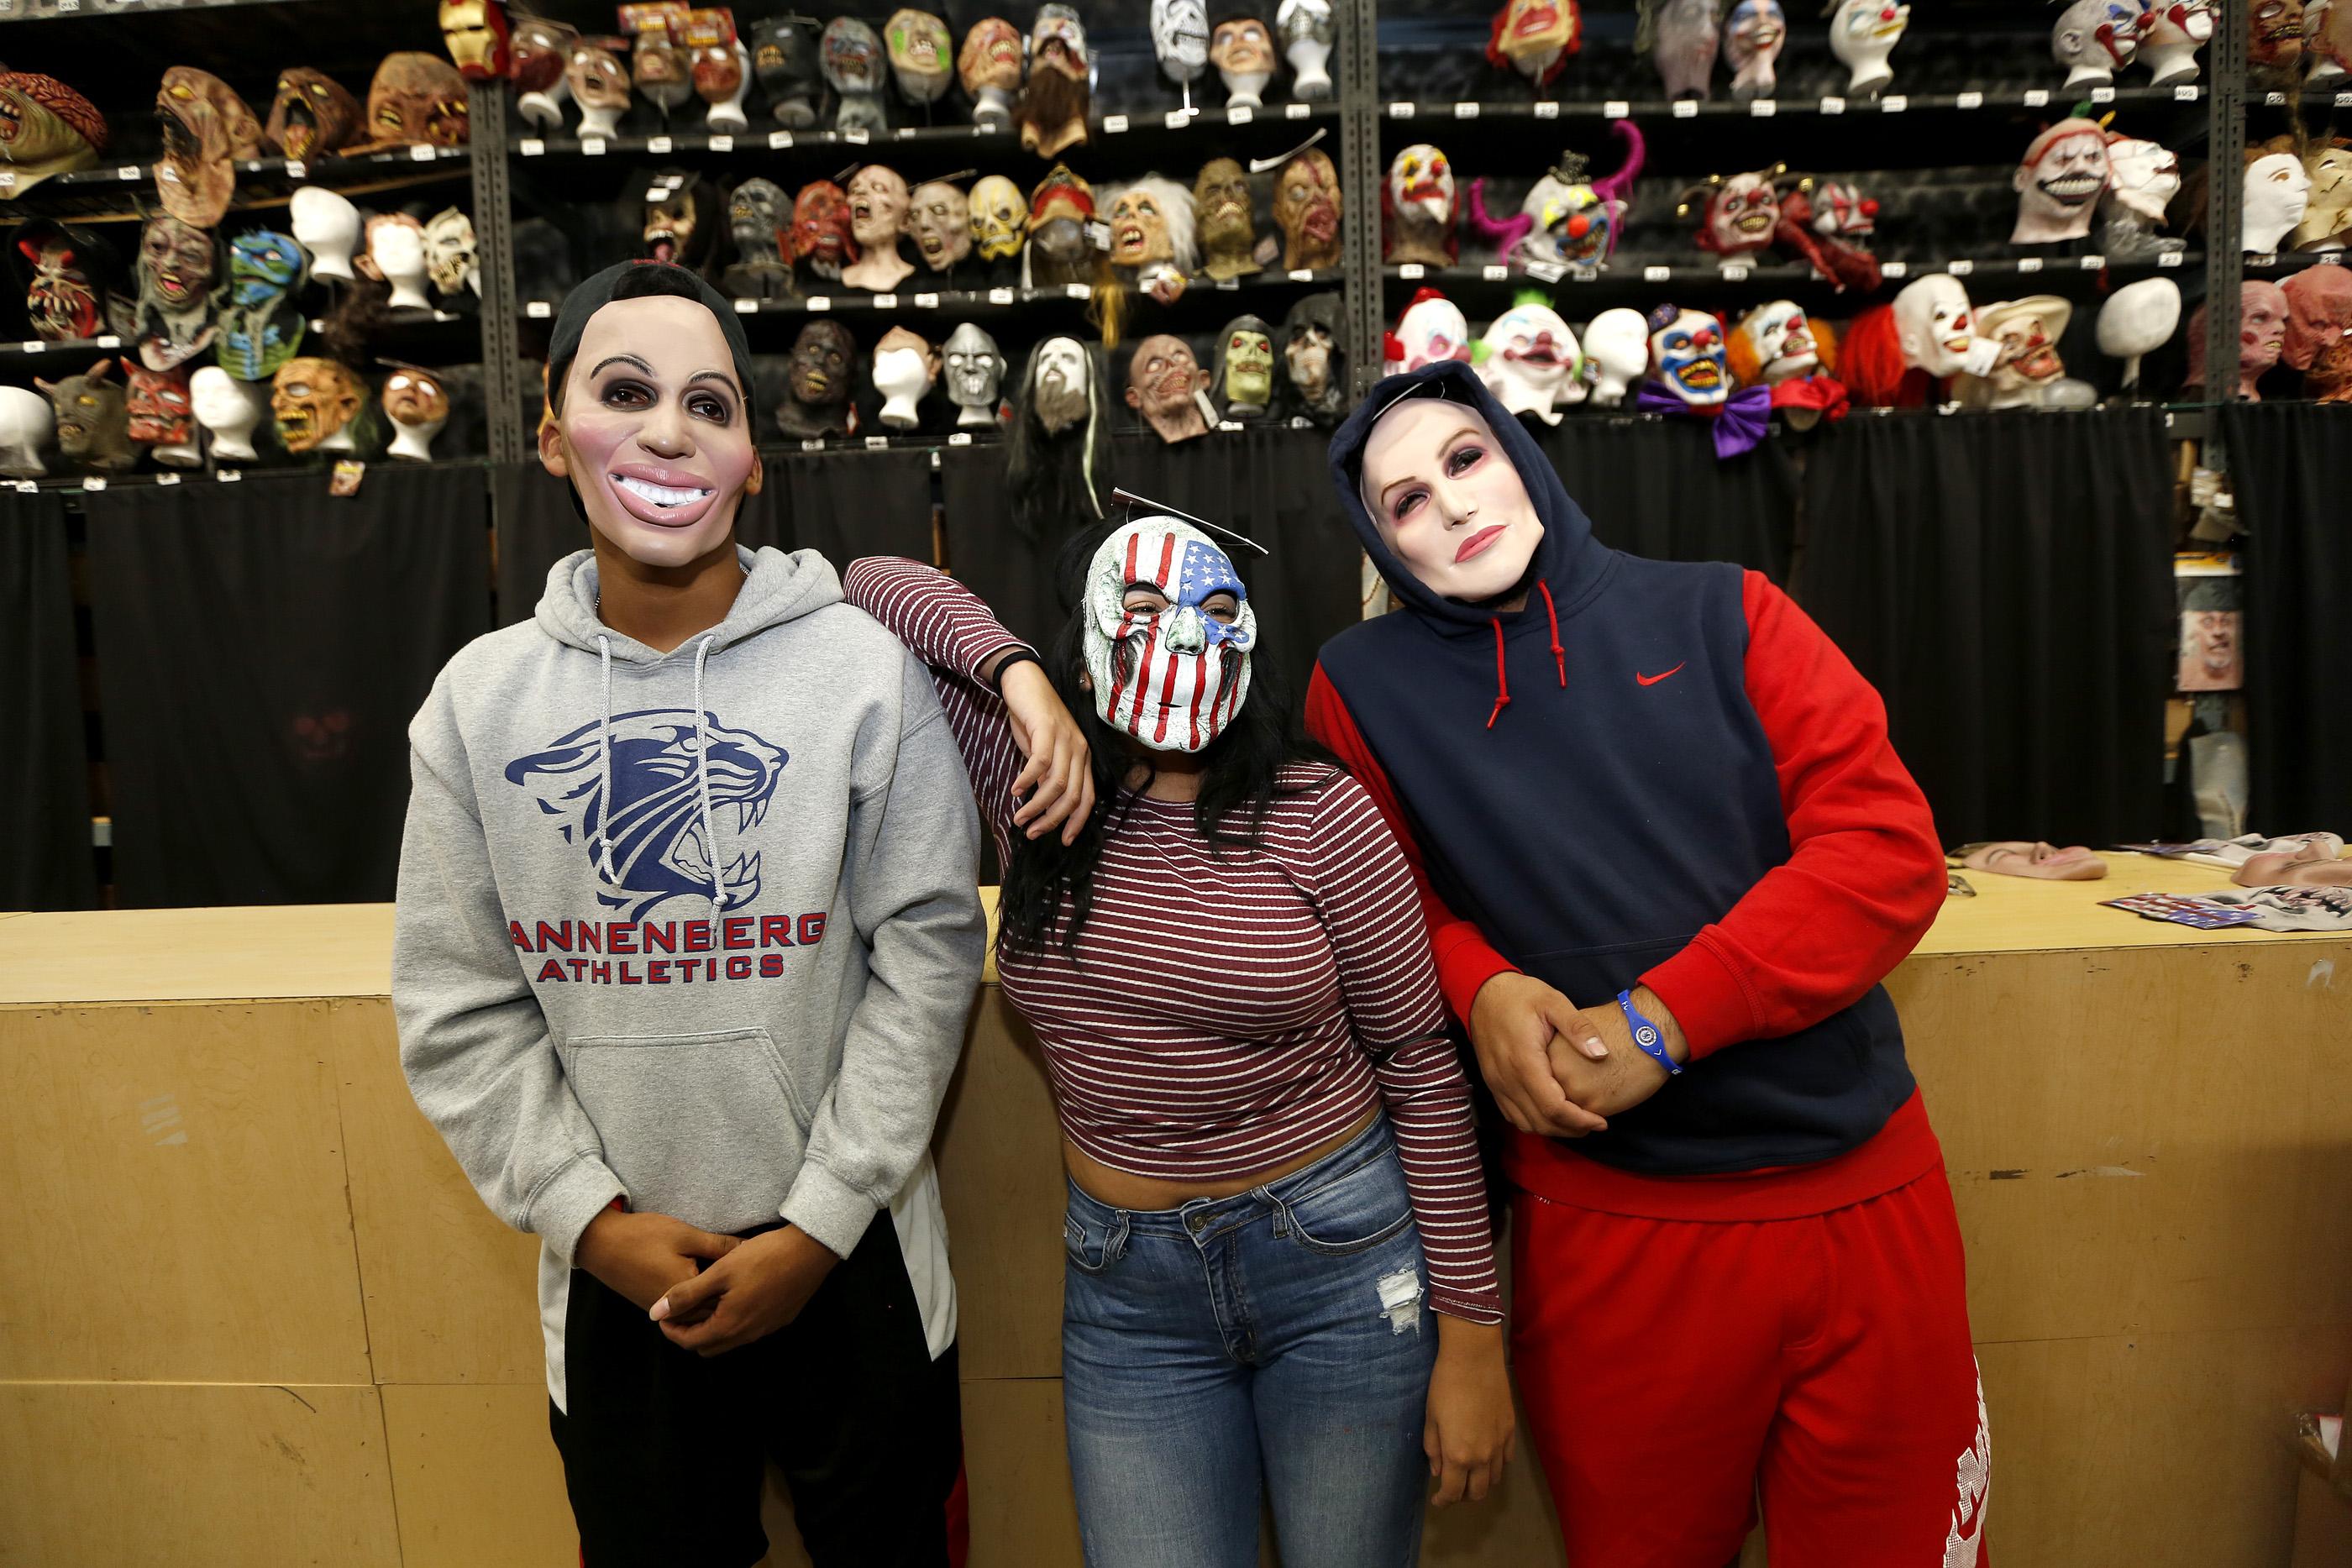 10/26/16 /LOS ANGELES/Cousins Anthony Jefferson, Leslie Martinez and Juan Nunez shop for their Halloween customs at the Halloween Club store in Montebello. (Photo by Aurelia Ventura/La Opinion)